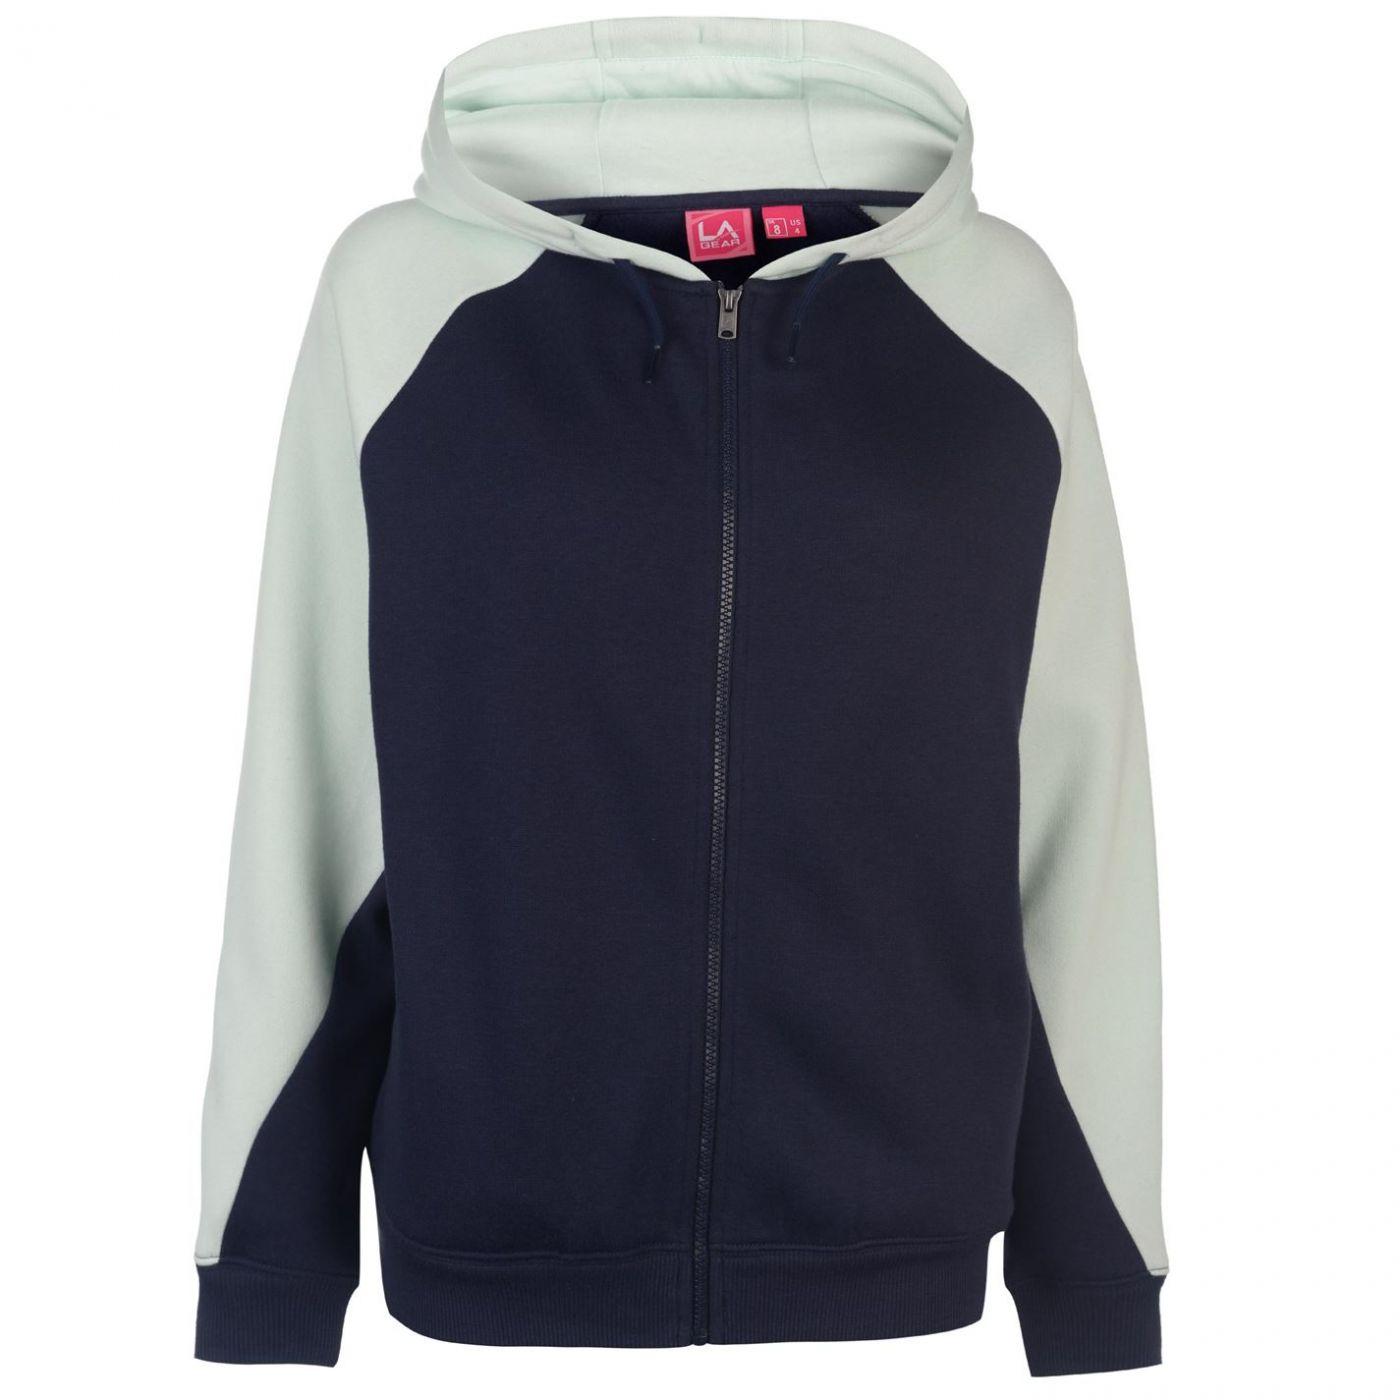 LA Gear Cut and Sew Full Zipped Hoody Ladies